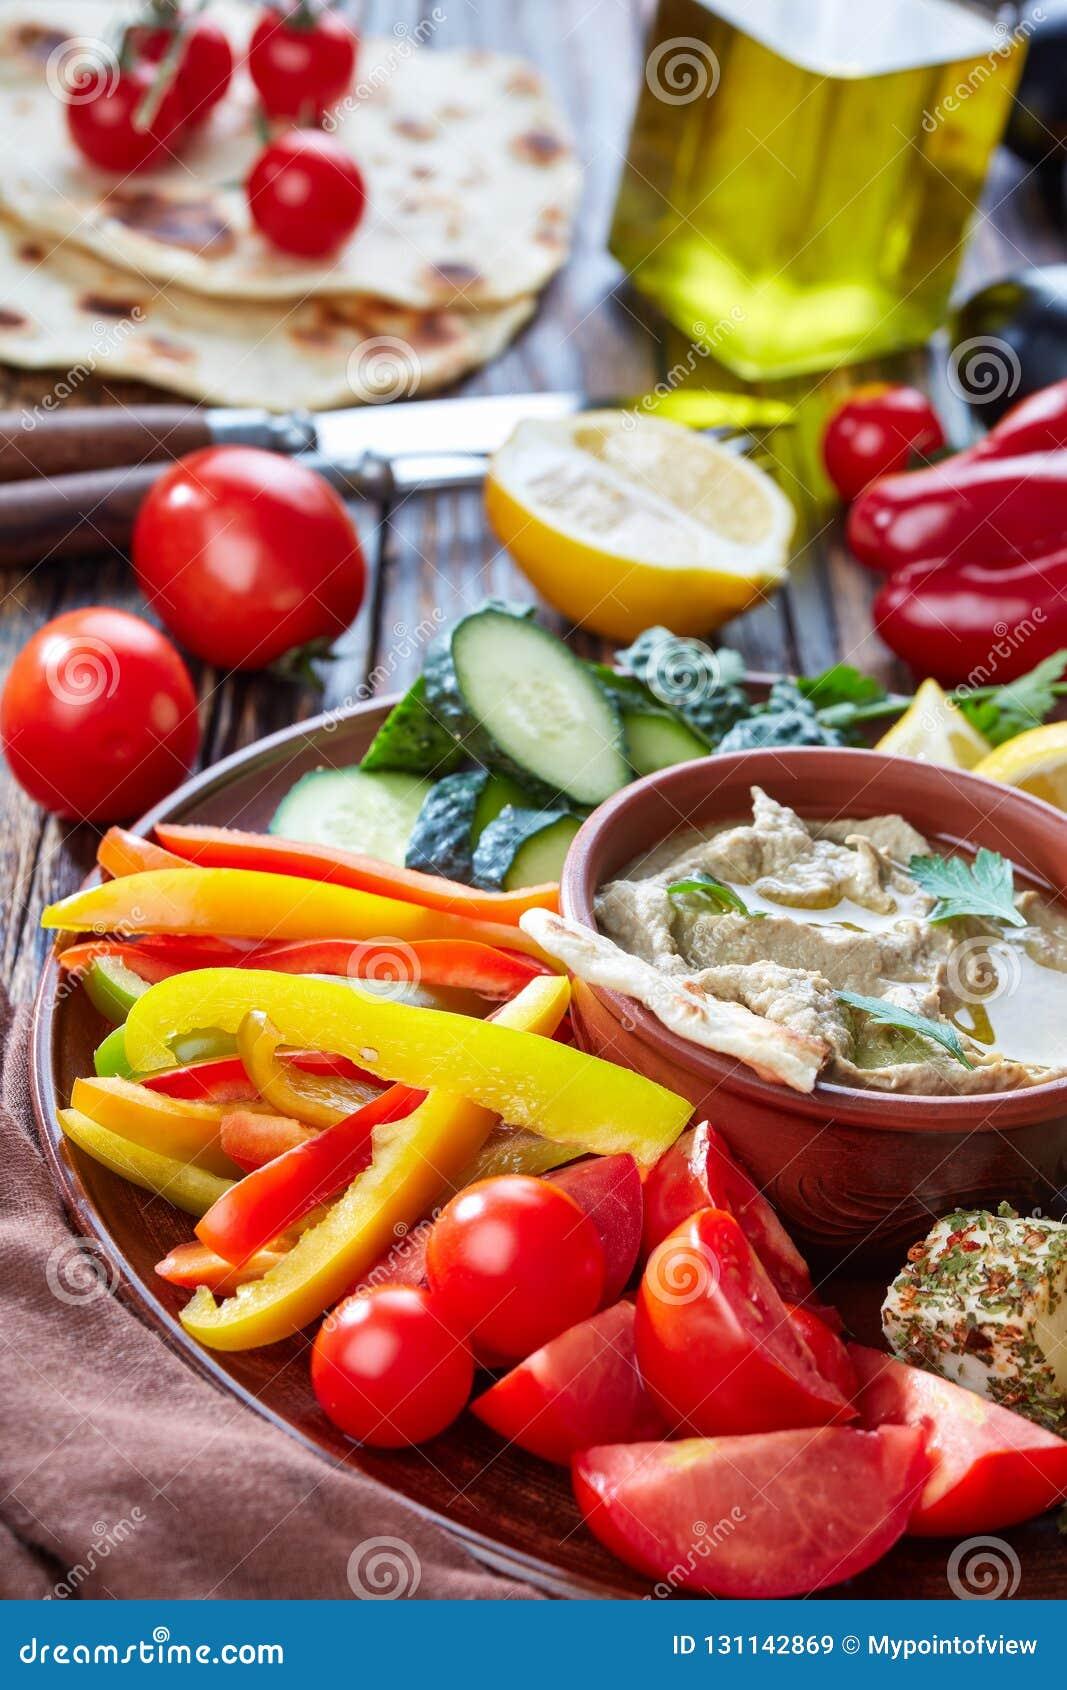 Schotel met veggiess en baba ganoush onderdompeling